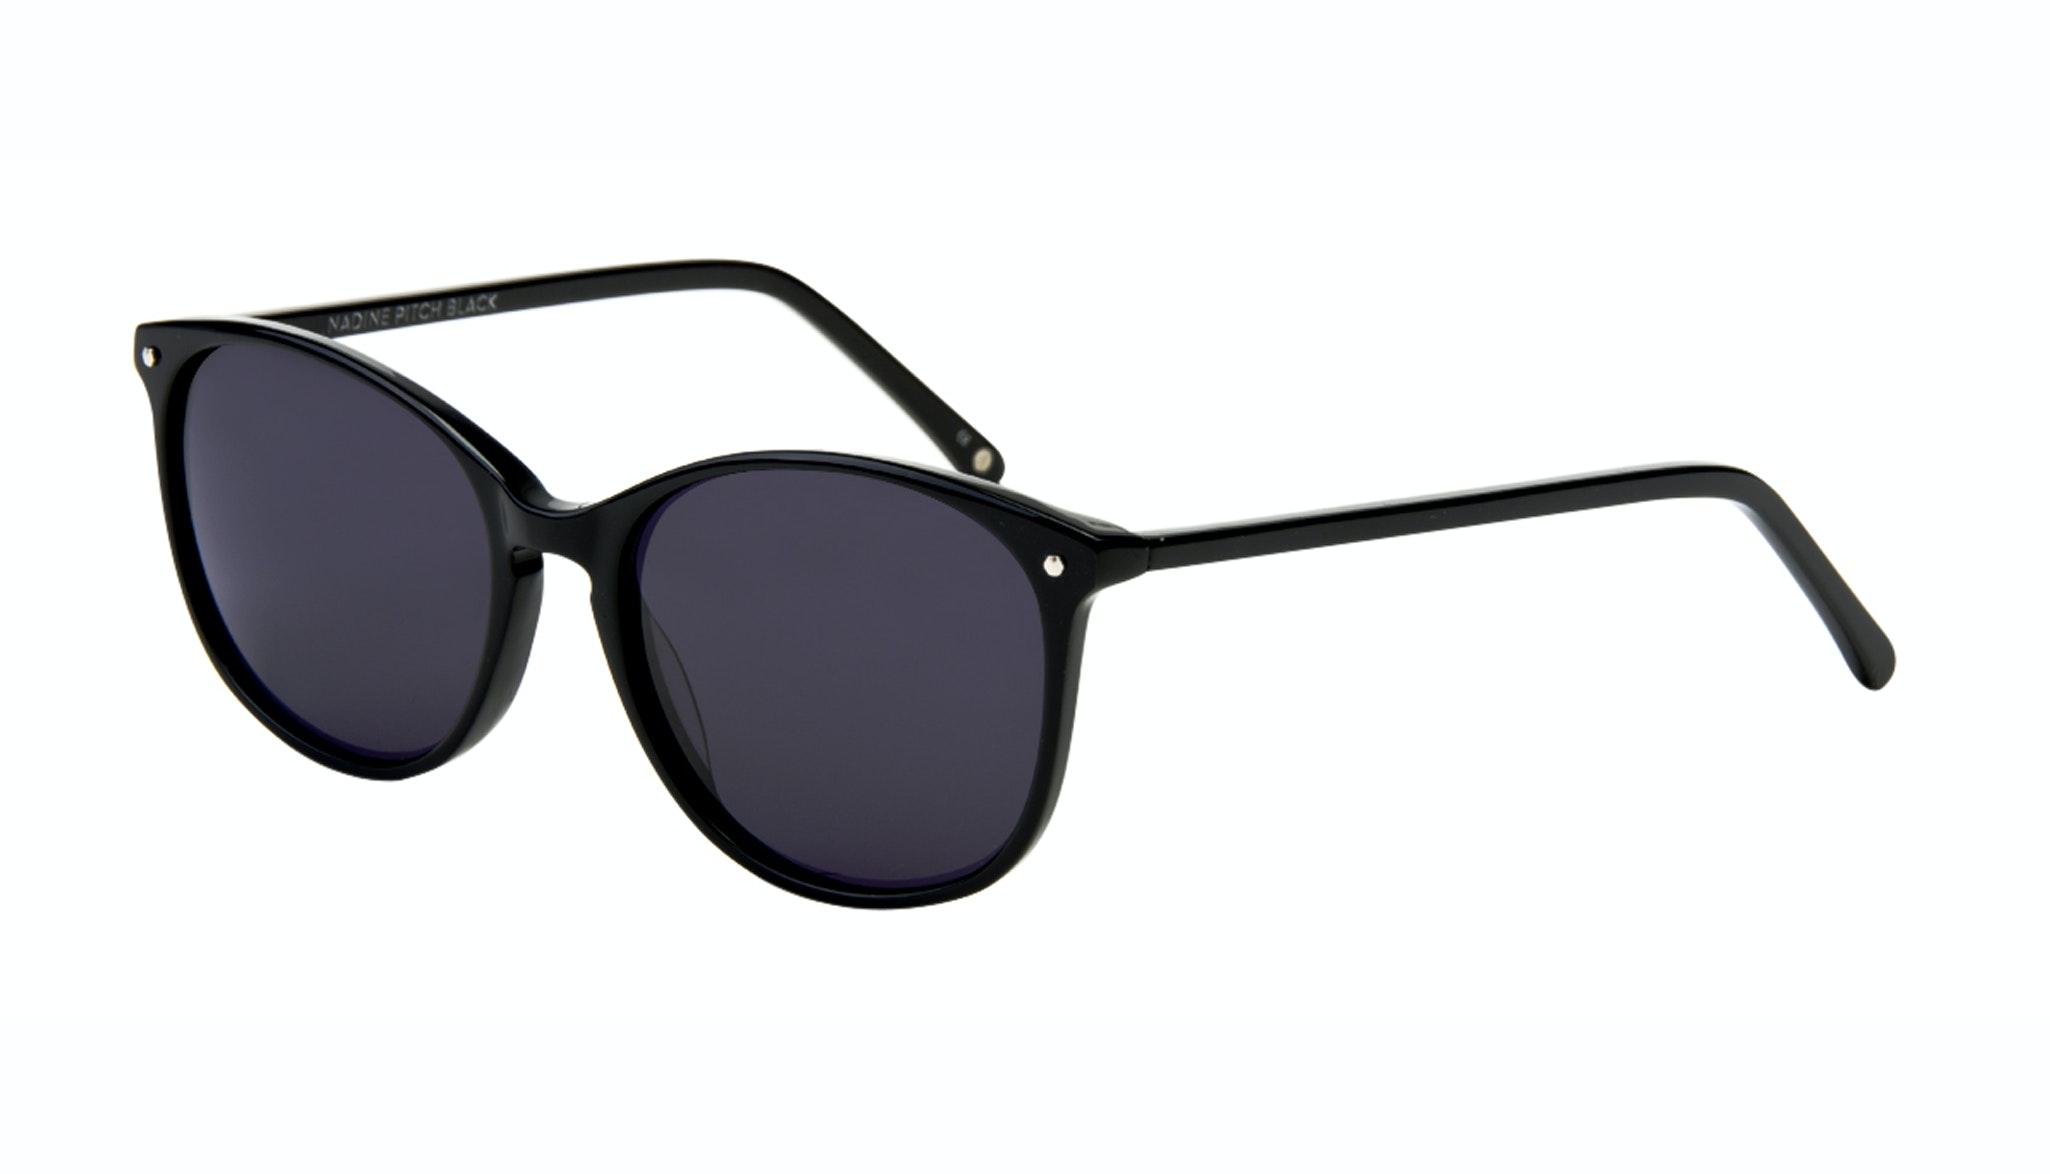 Affordable Fashion Glasses Rectangle Square Round Sunglasses Women Nadine Pitch Black Tilt